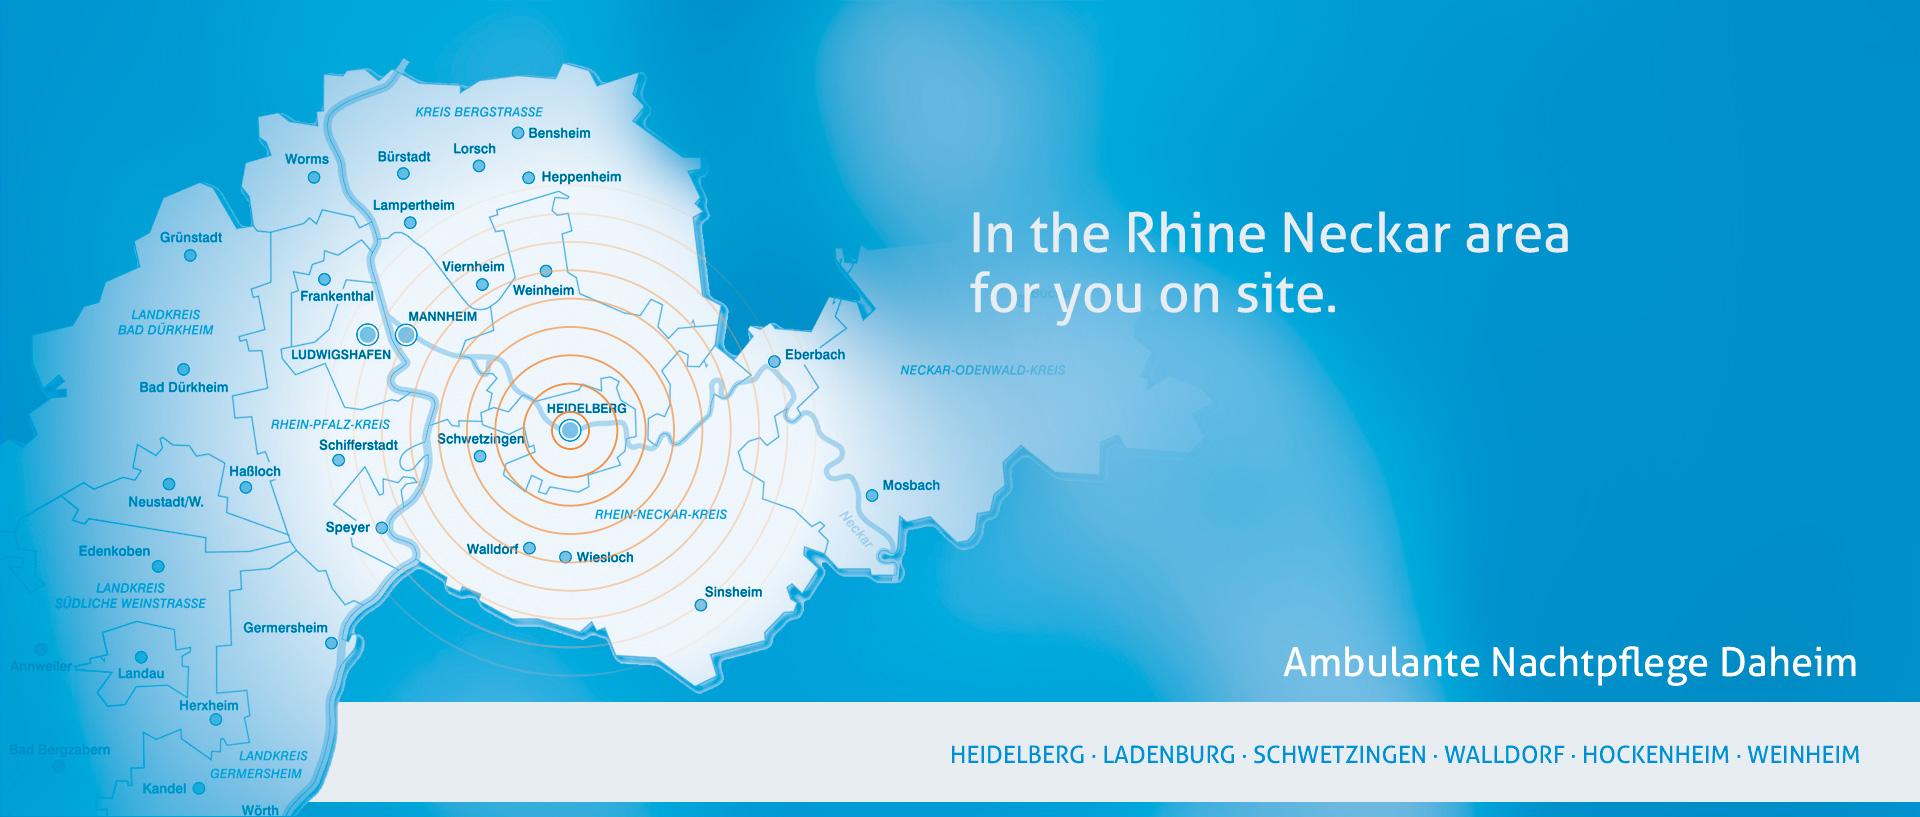 Rhin-Neckar-en.jpg